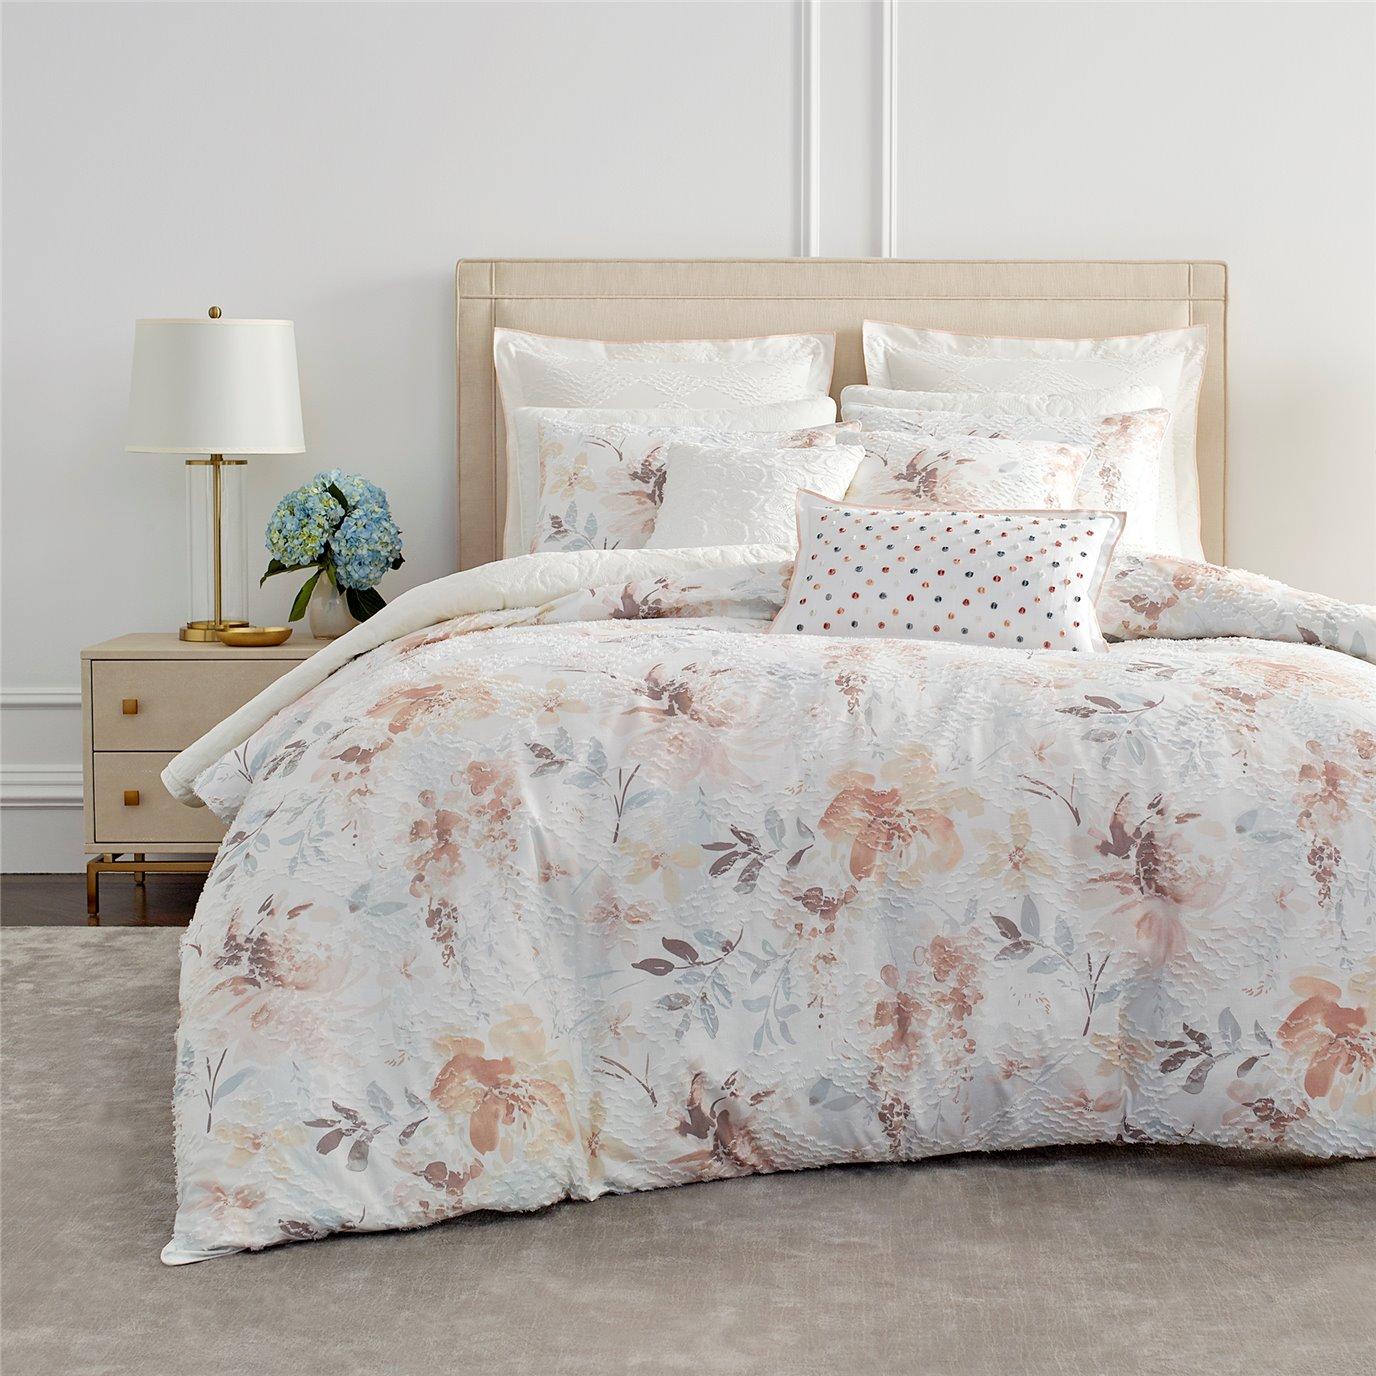 Croscill Liana King 3pc Comforter Set